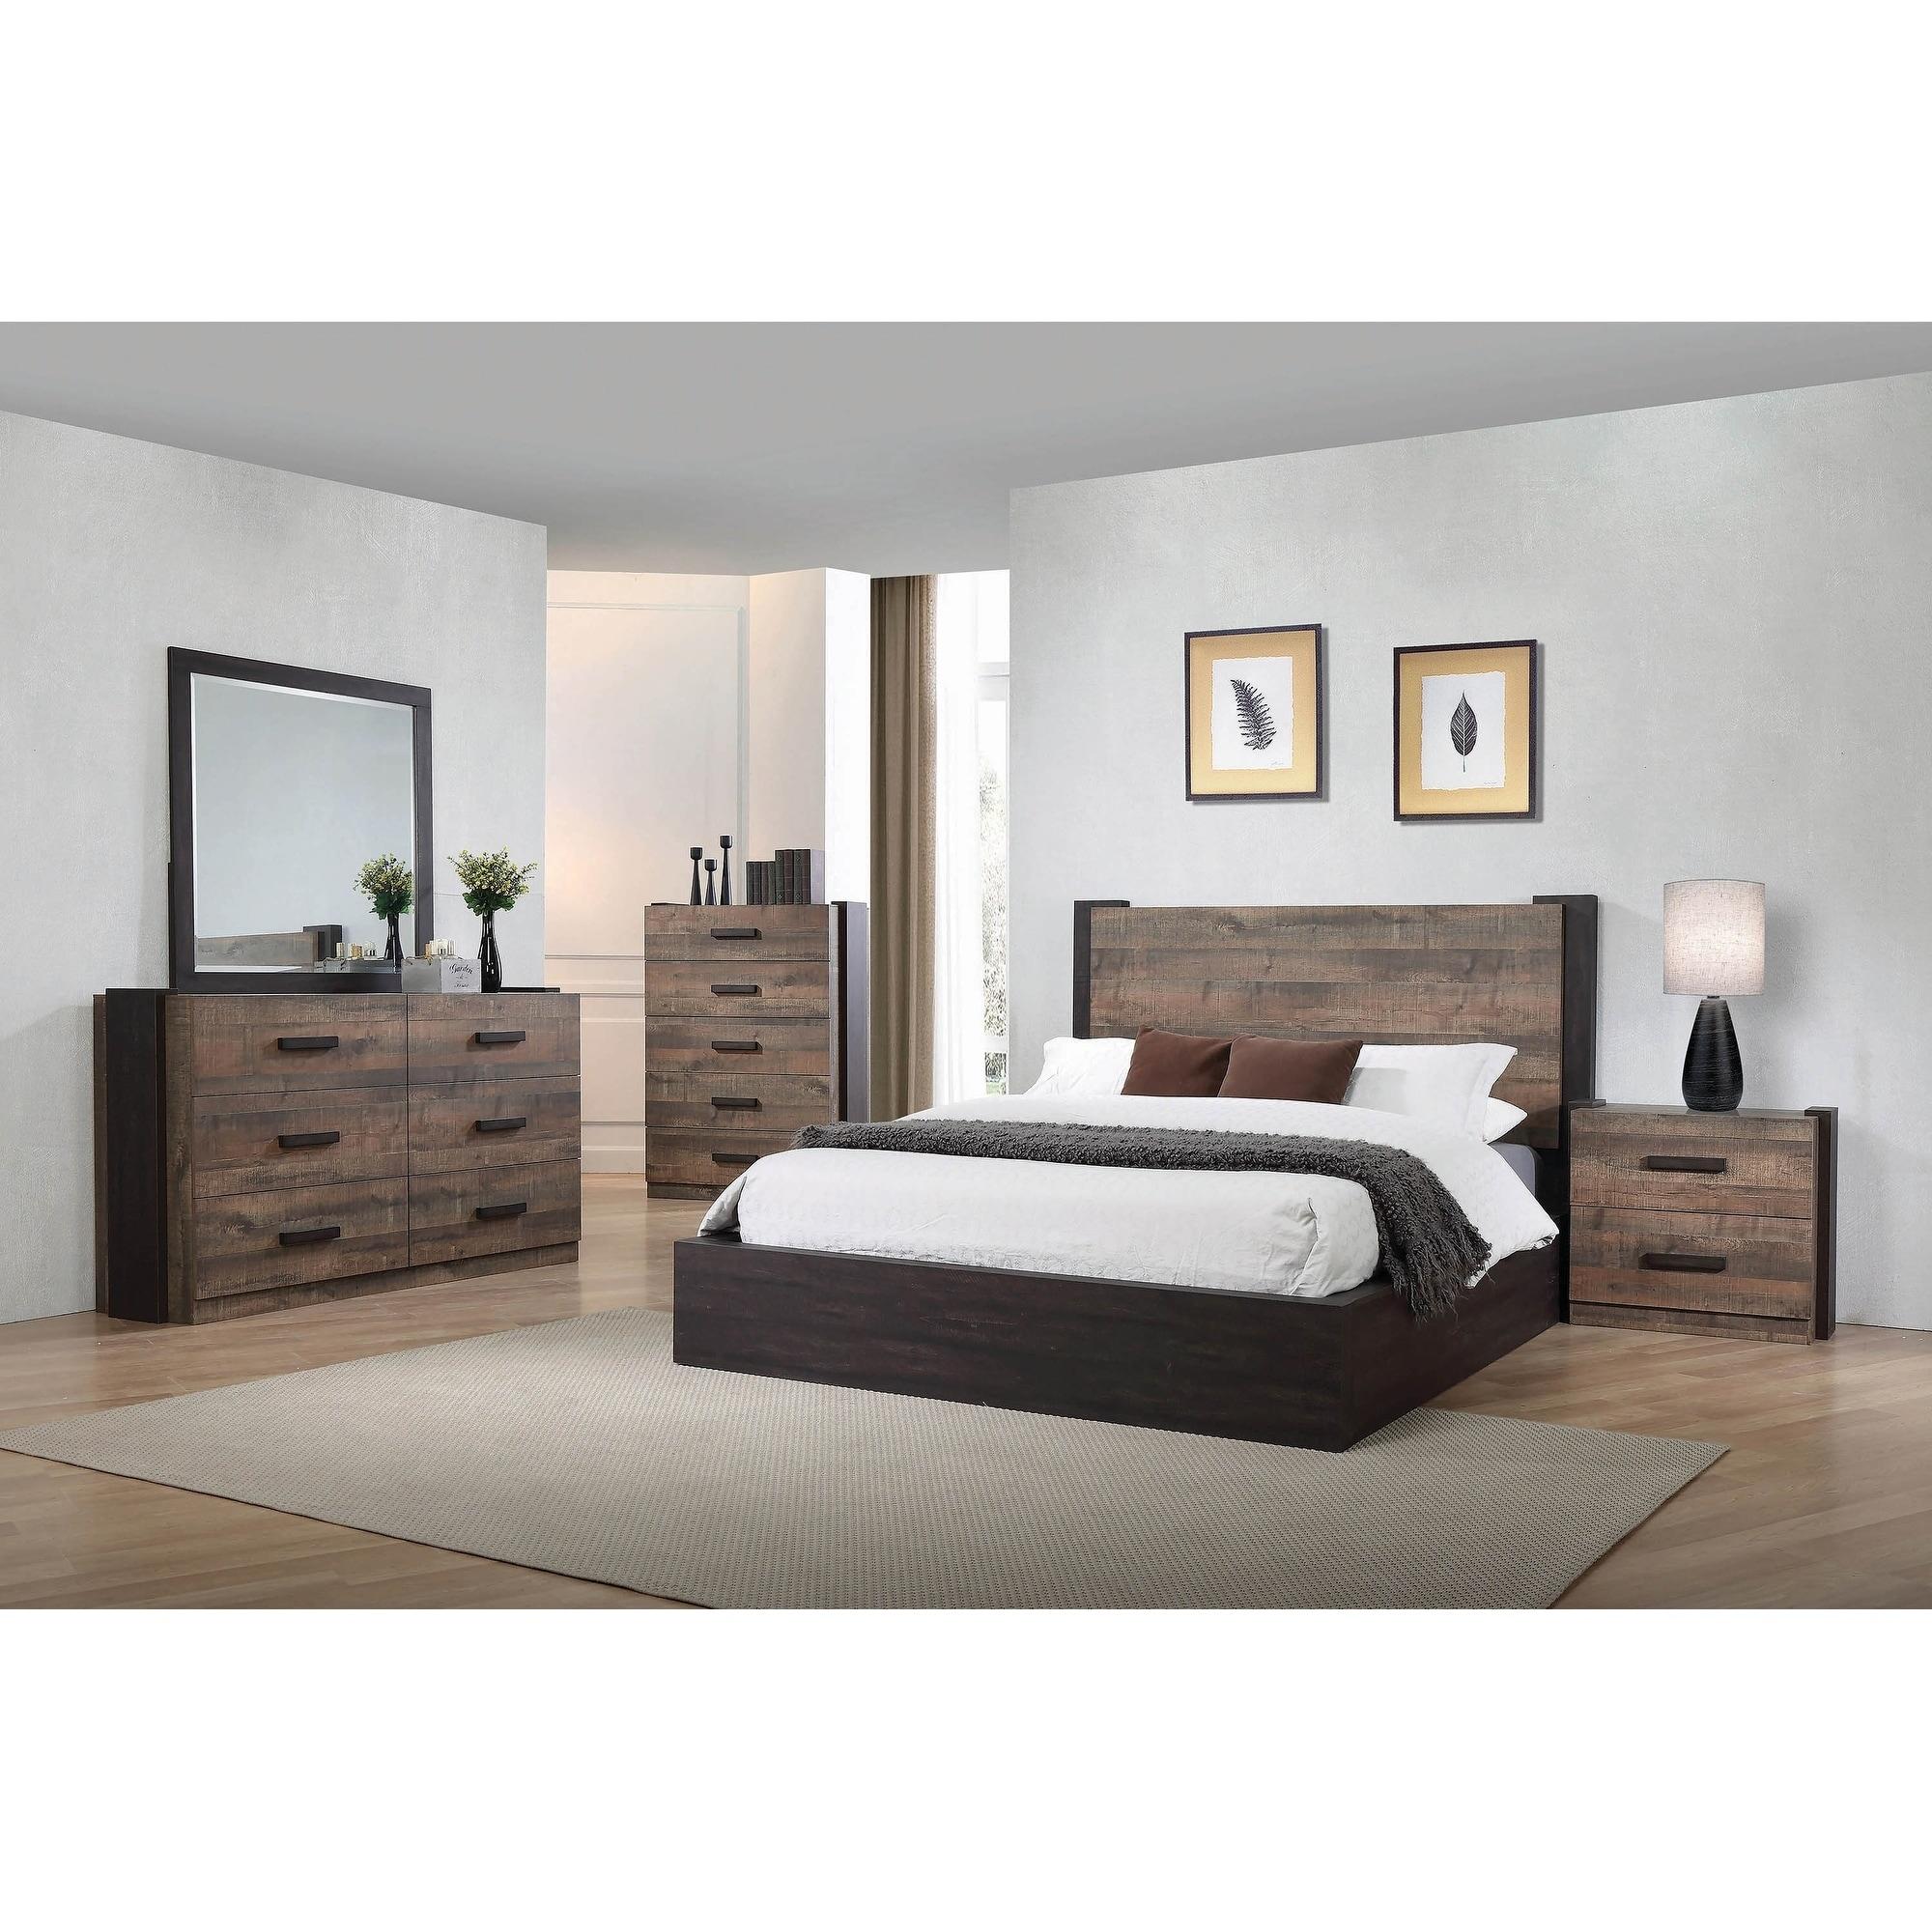 Shop Carbon Loft Domnhall Weathered Oak 6 Piece Platform Bedroom